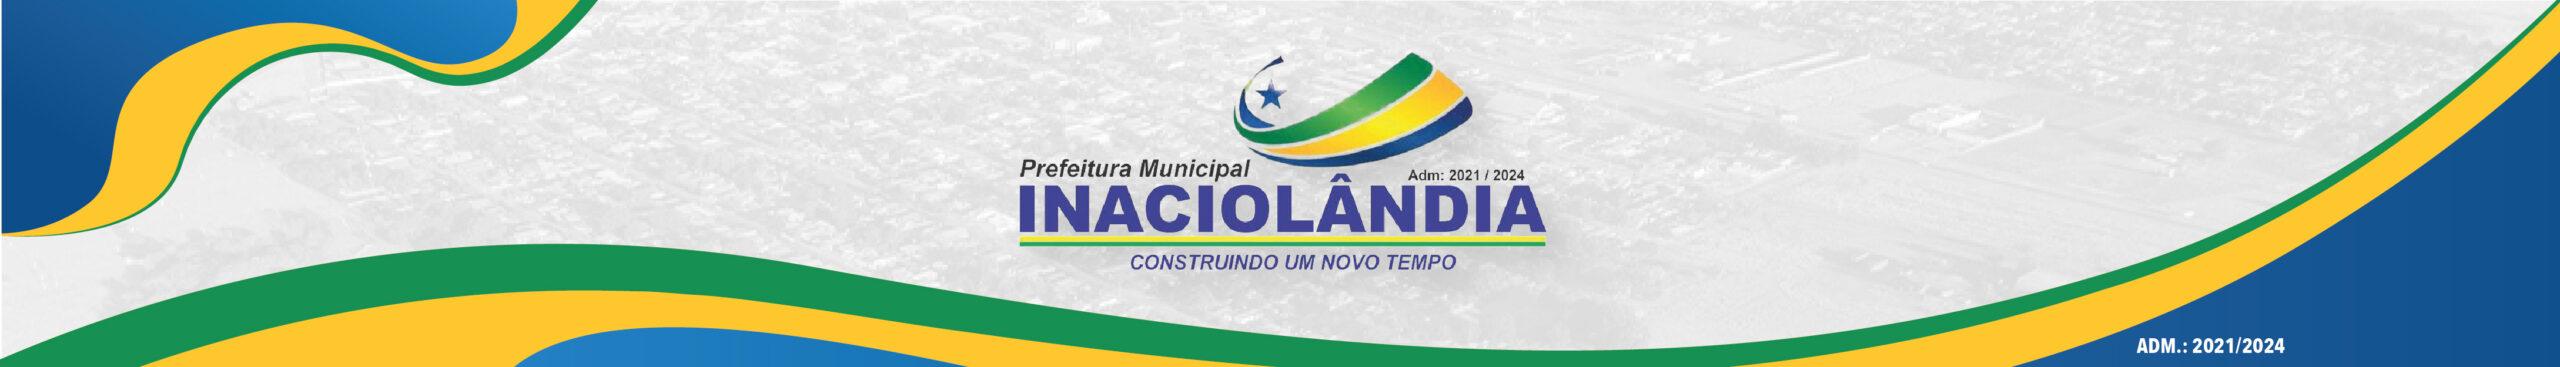 Prefeitura Municipal de Inaciolândia